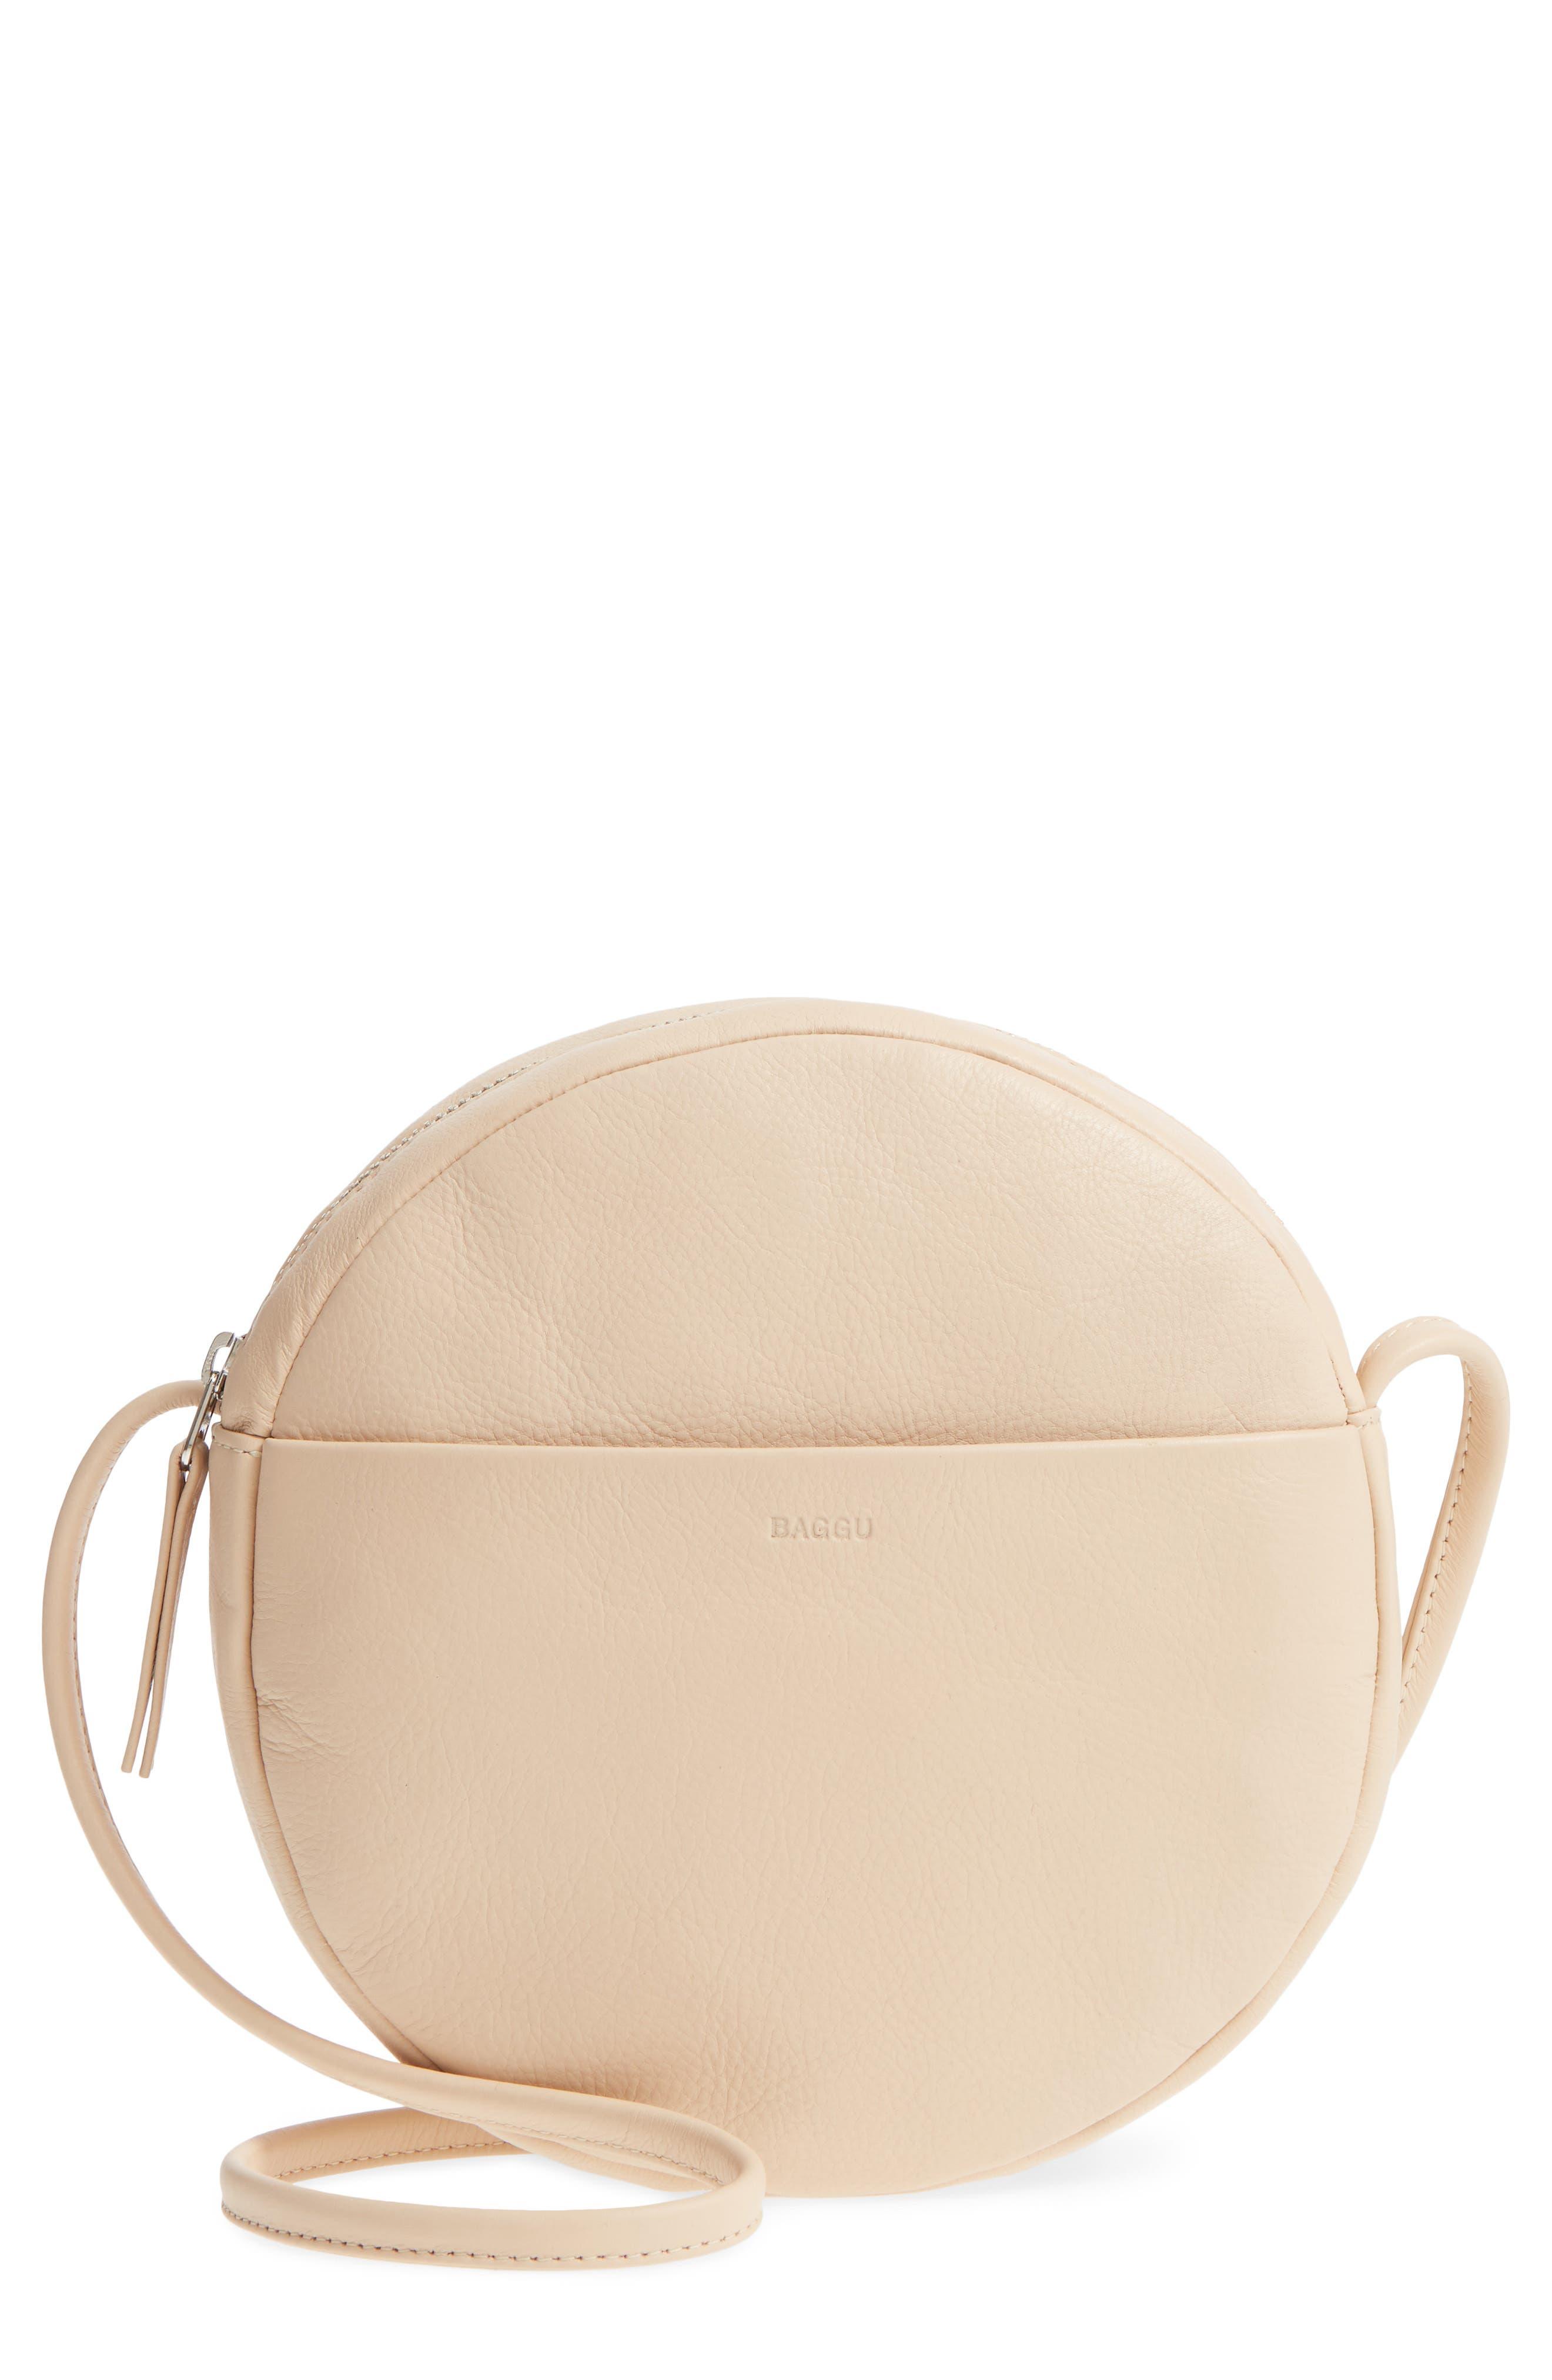 Circle Calfskin Leather Crossbody Bag,                             Main thumbnail 3, color,